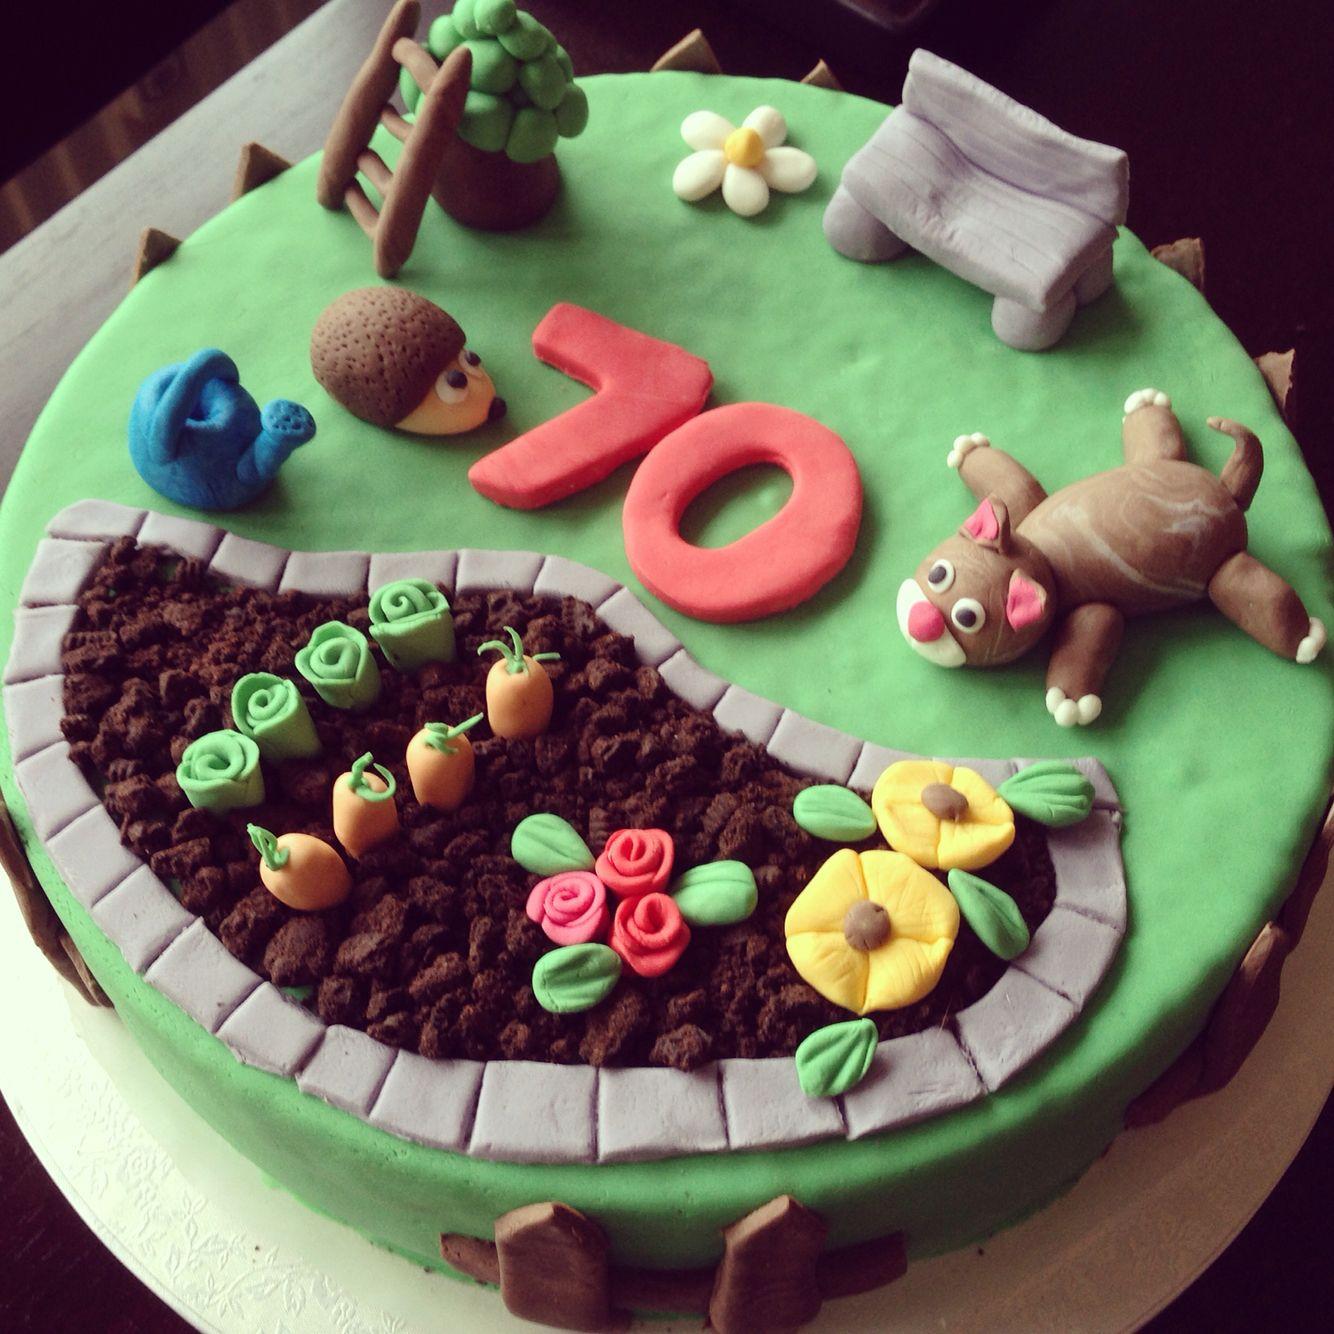 Garten Torte Cake Fondant Sweet Dreams Kuchen Gartenmotiv Tortenverzierungstipps Motivtorten